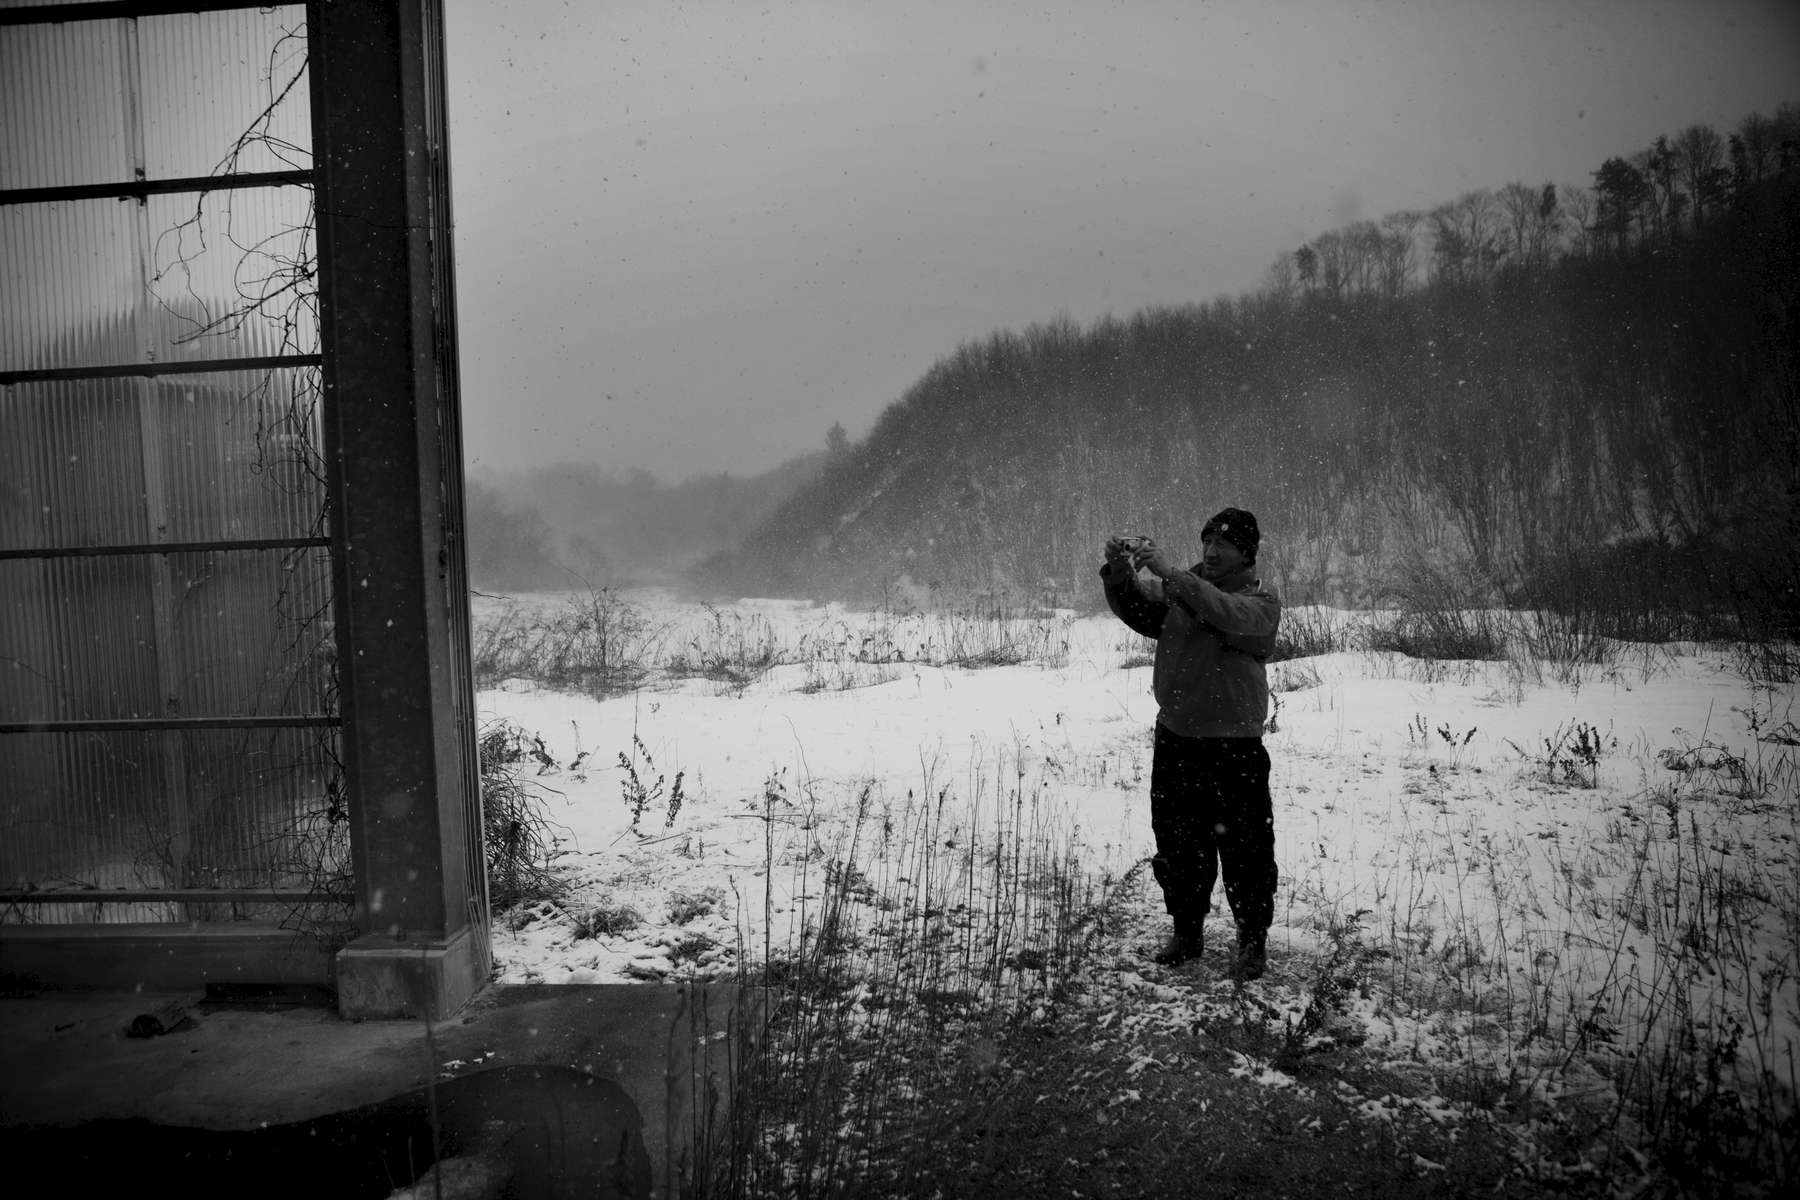 Dairy farmer ToshinorI Sanpei, 57, photographing a closed dairy farm cooperative compound in his radiation-contaminated village. Feb/ 2013, Tsushima, Namie.